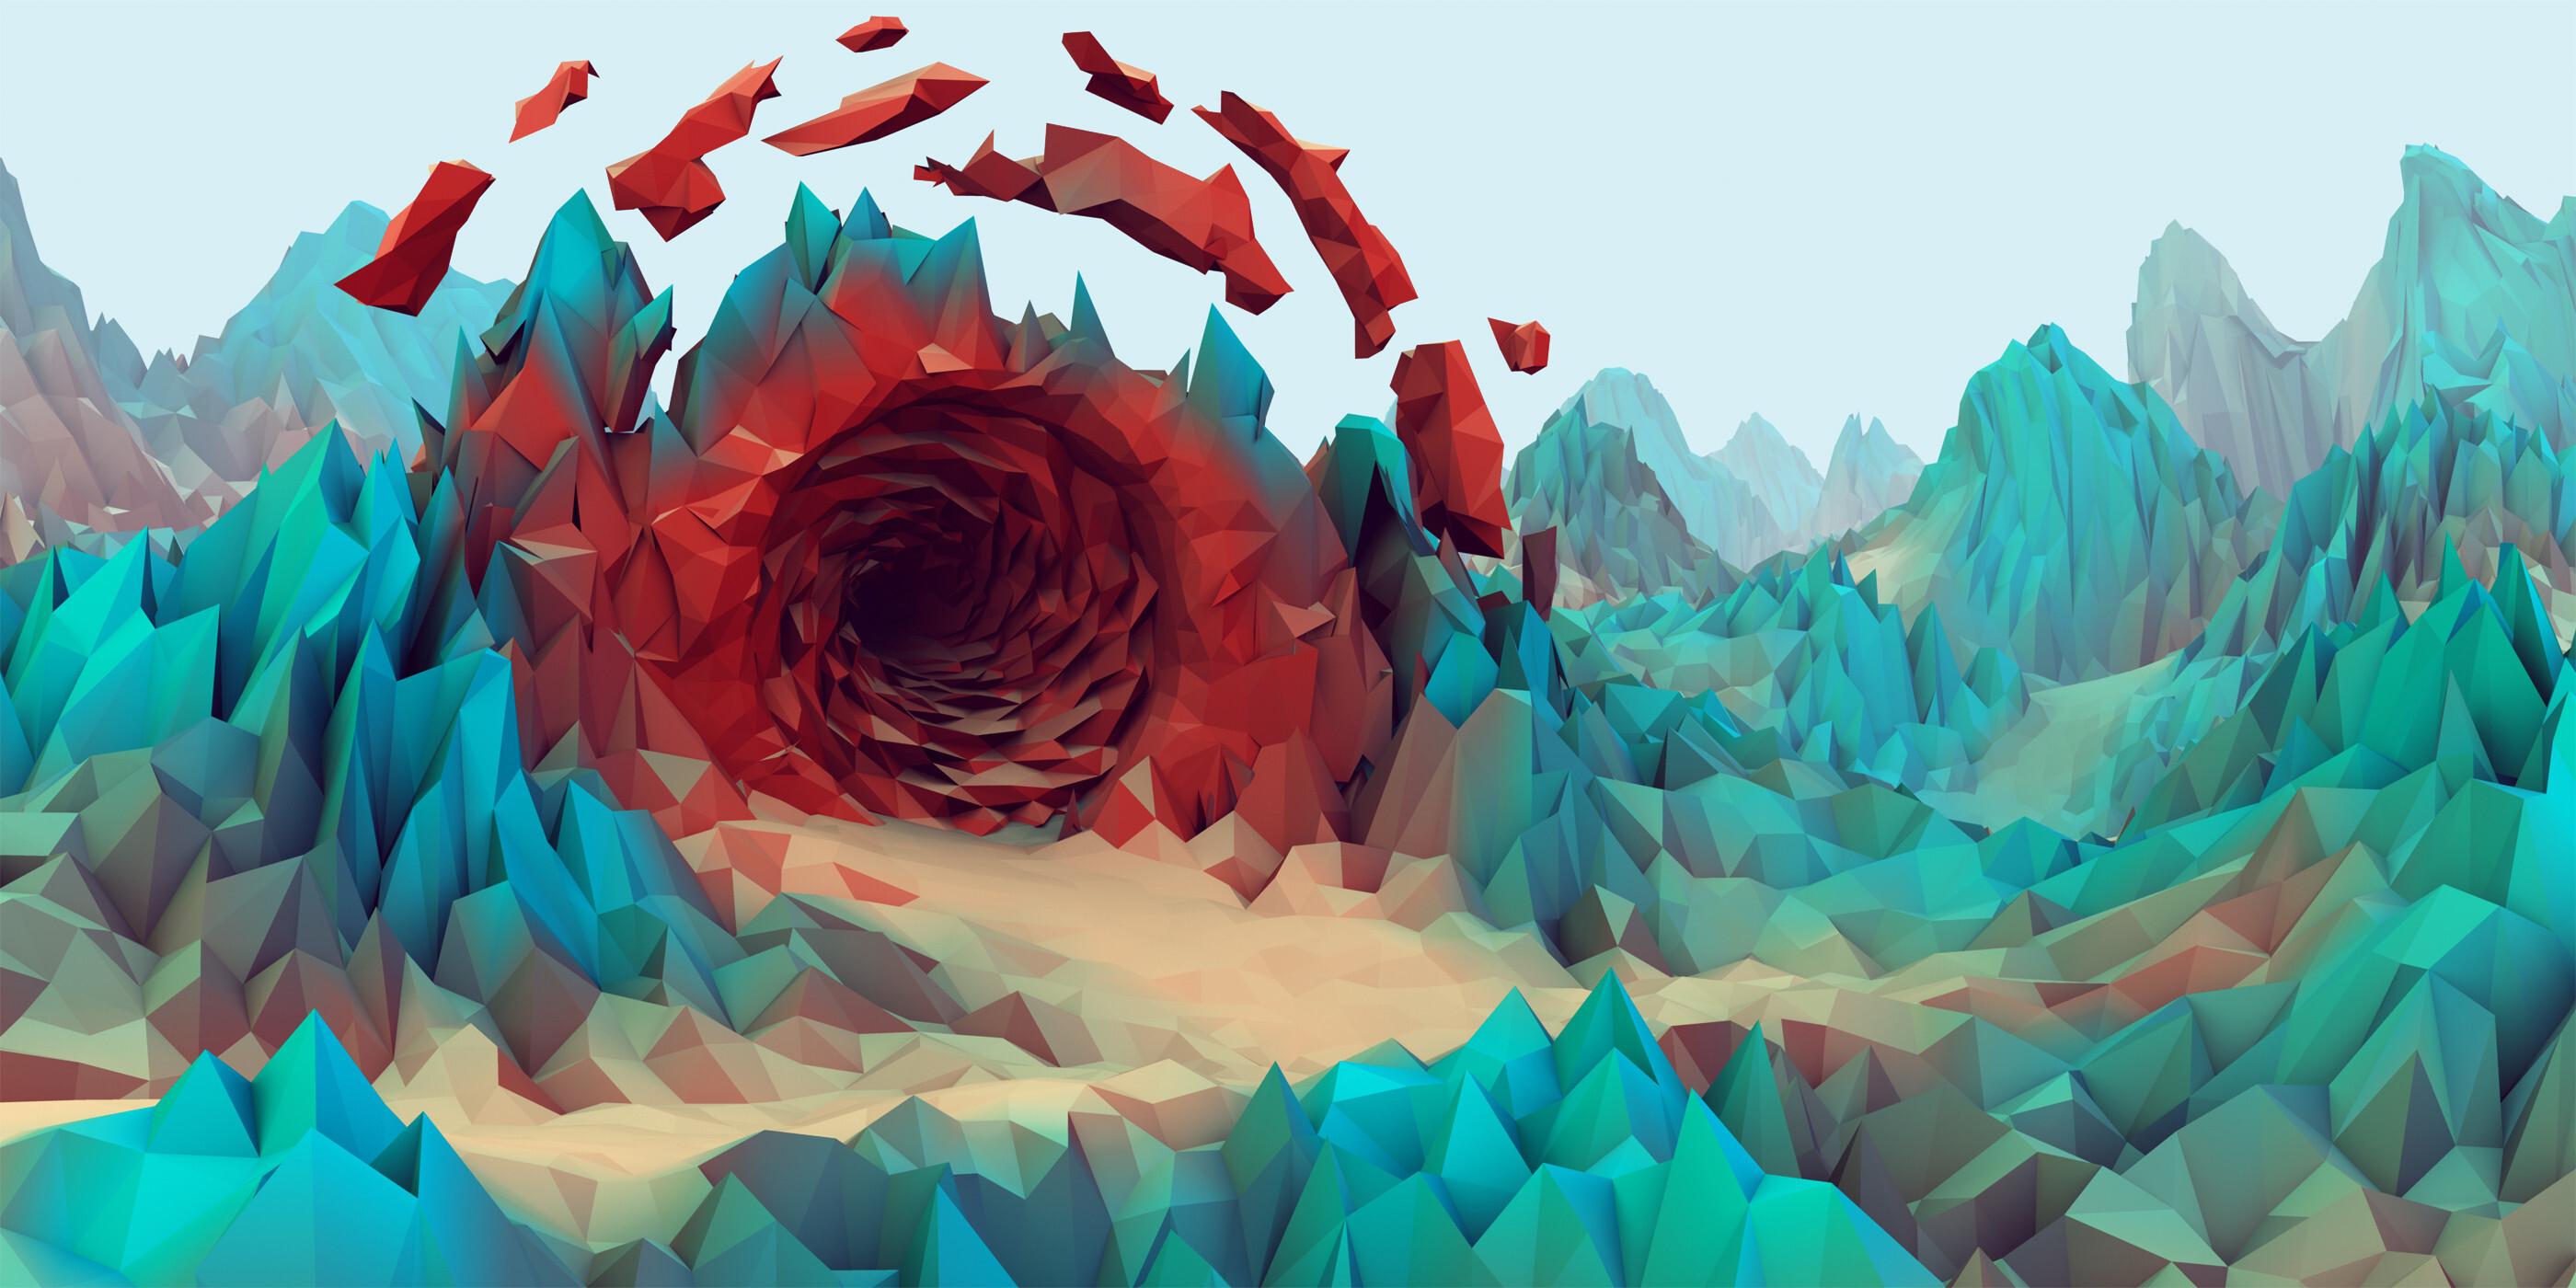 Third Low Poly Art Pubg: Rising Phoenix